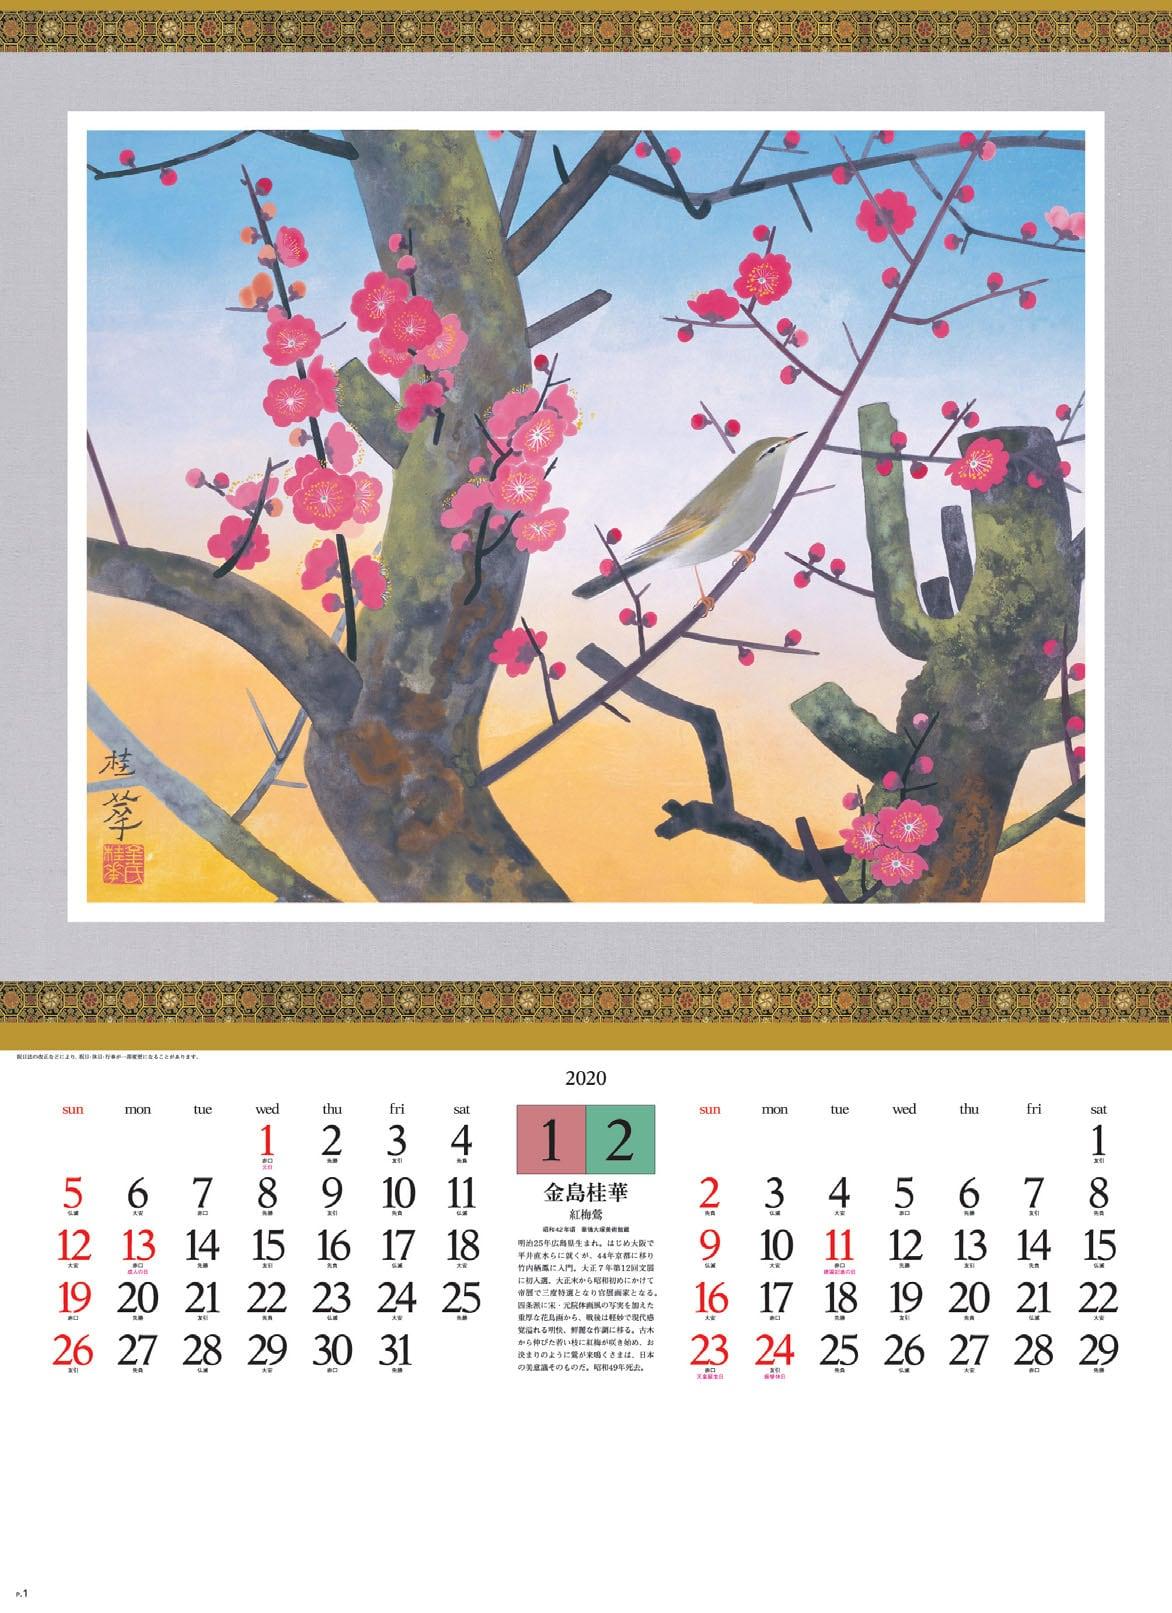 画像:金島桂華 「紅梅鶯」 日本画巨匠名品集 2020年カレンダー